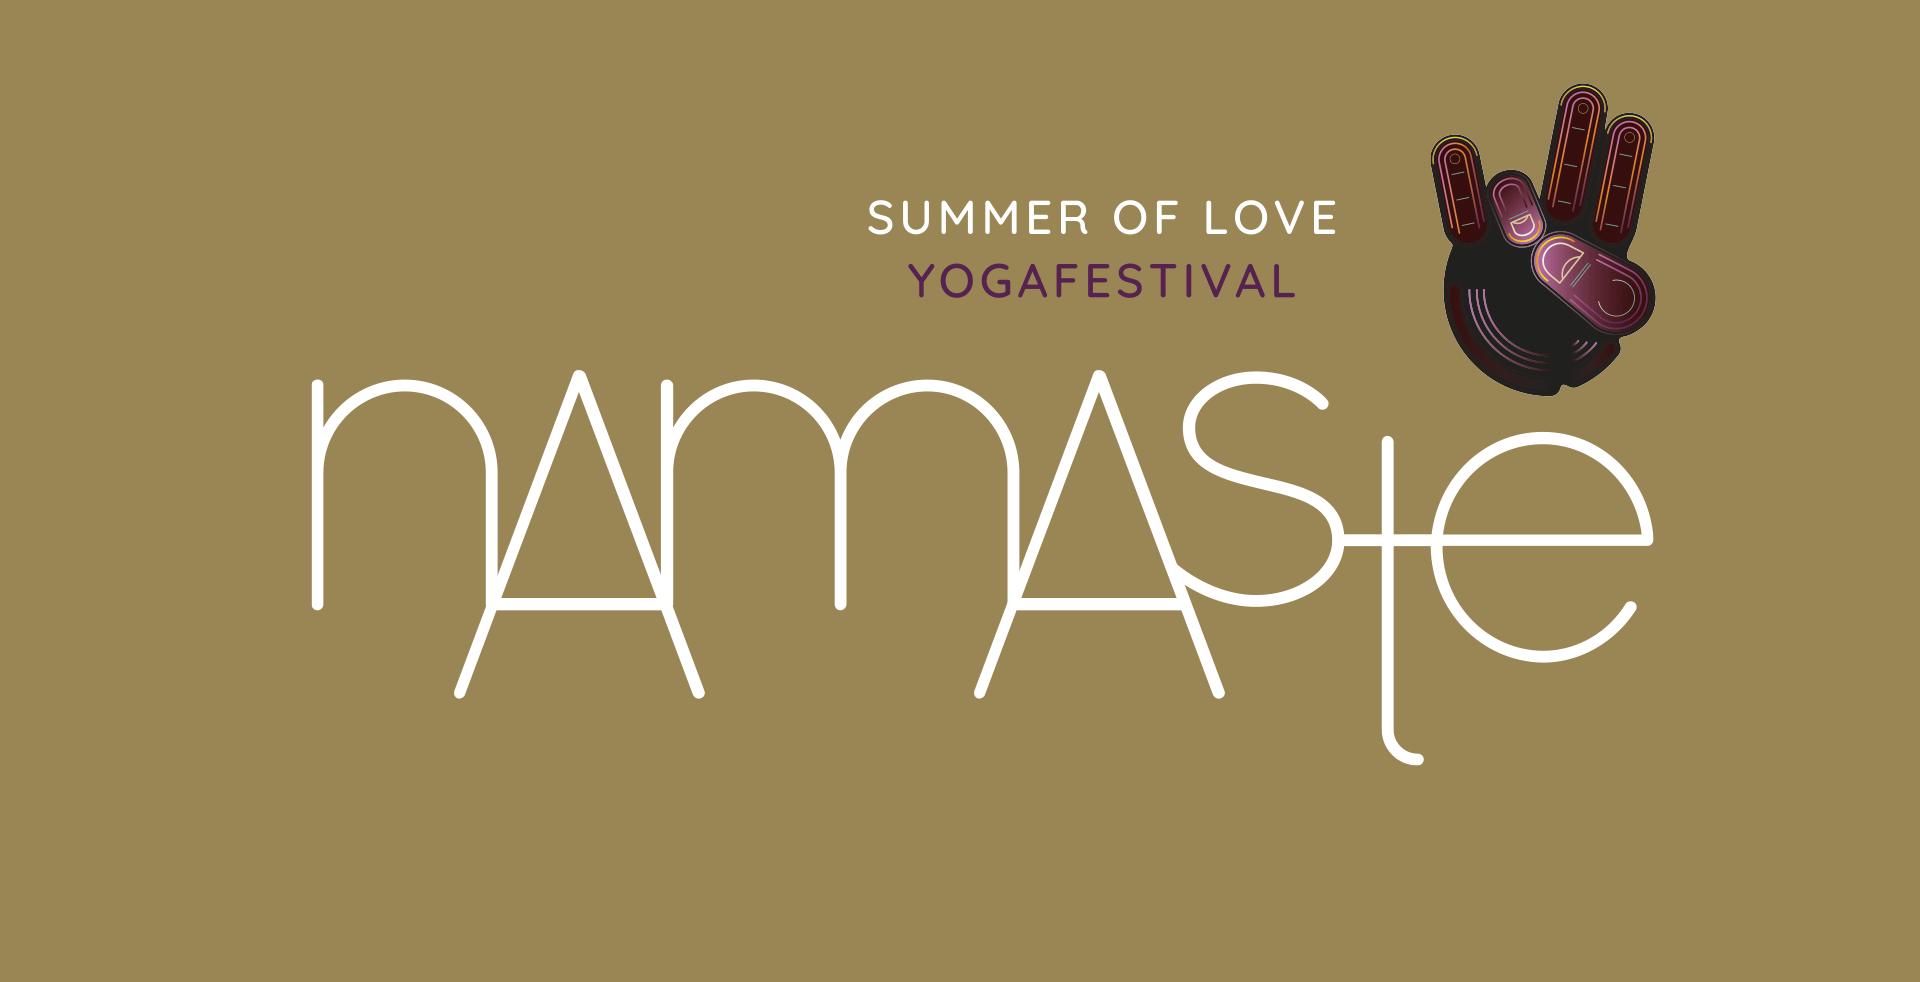 Summer of Love Yogafestival Plane 3